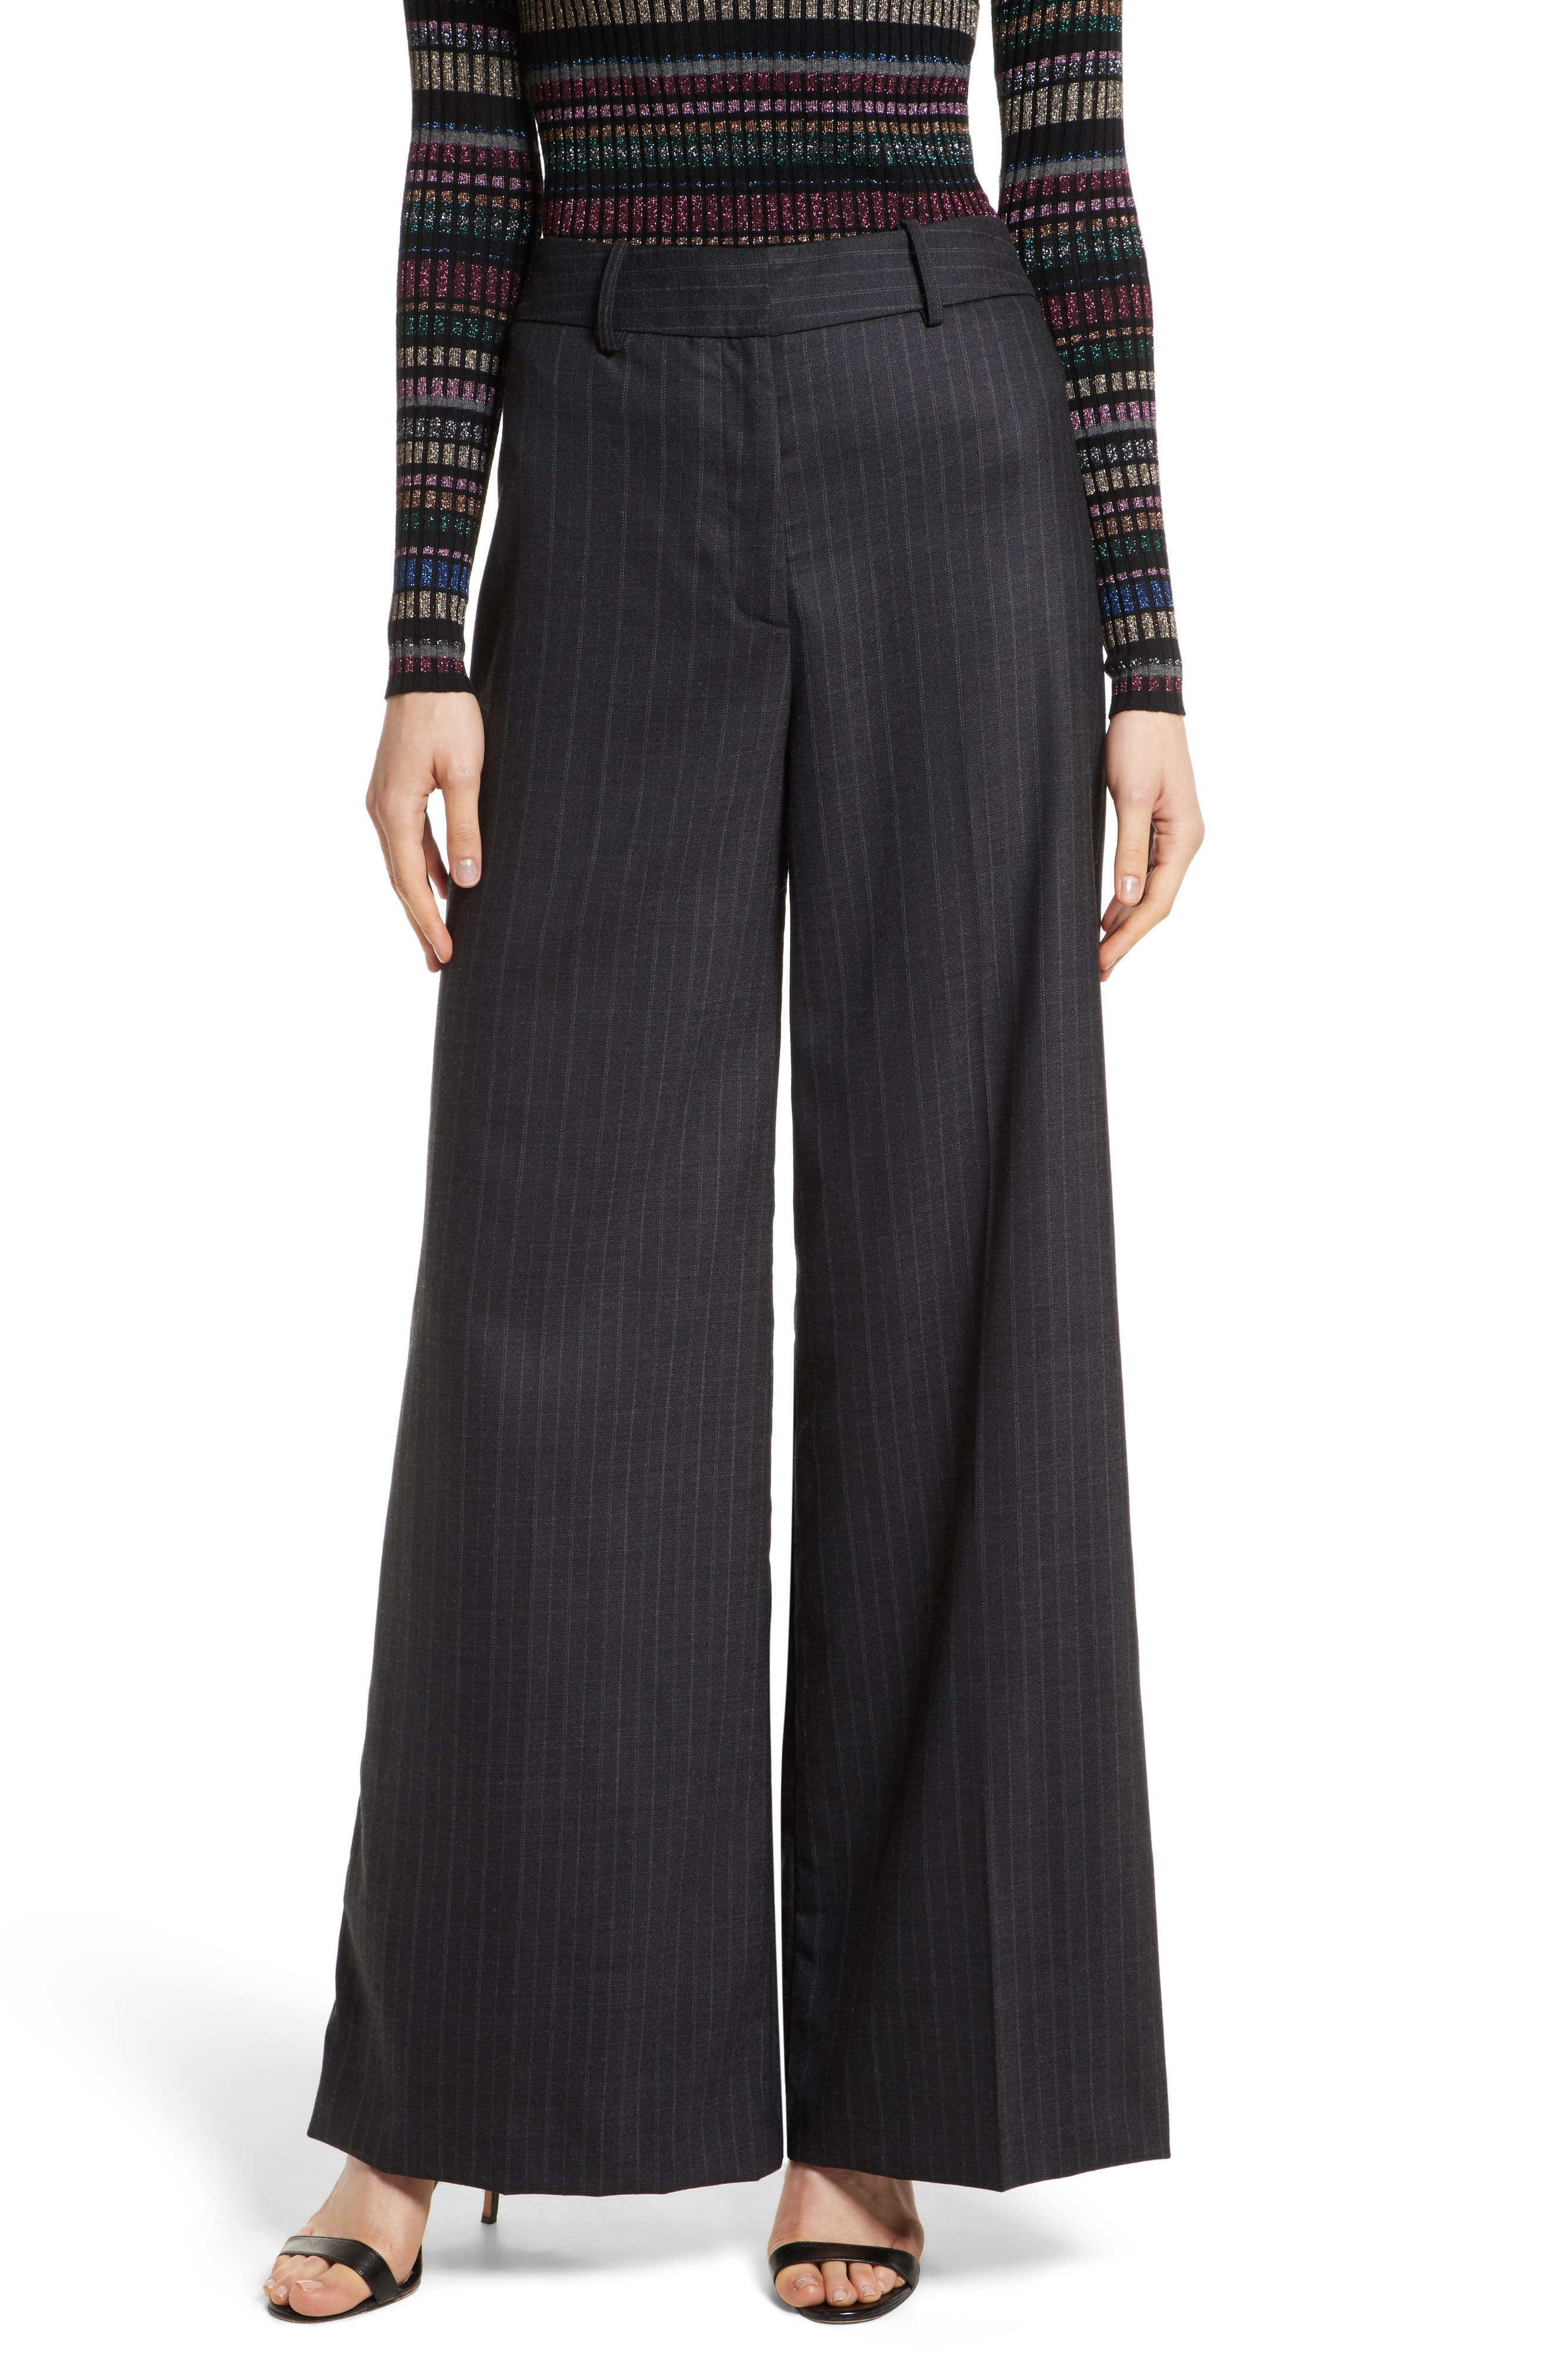 Sia Pinstripe Italian Stretch Wool Trousers,                             Main thumbnail 1, color,                             Grey Stripe